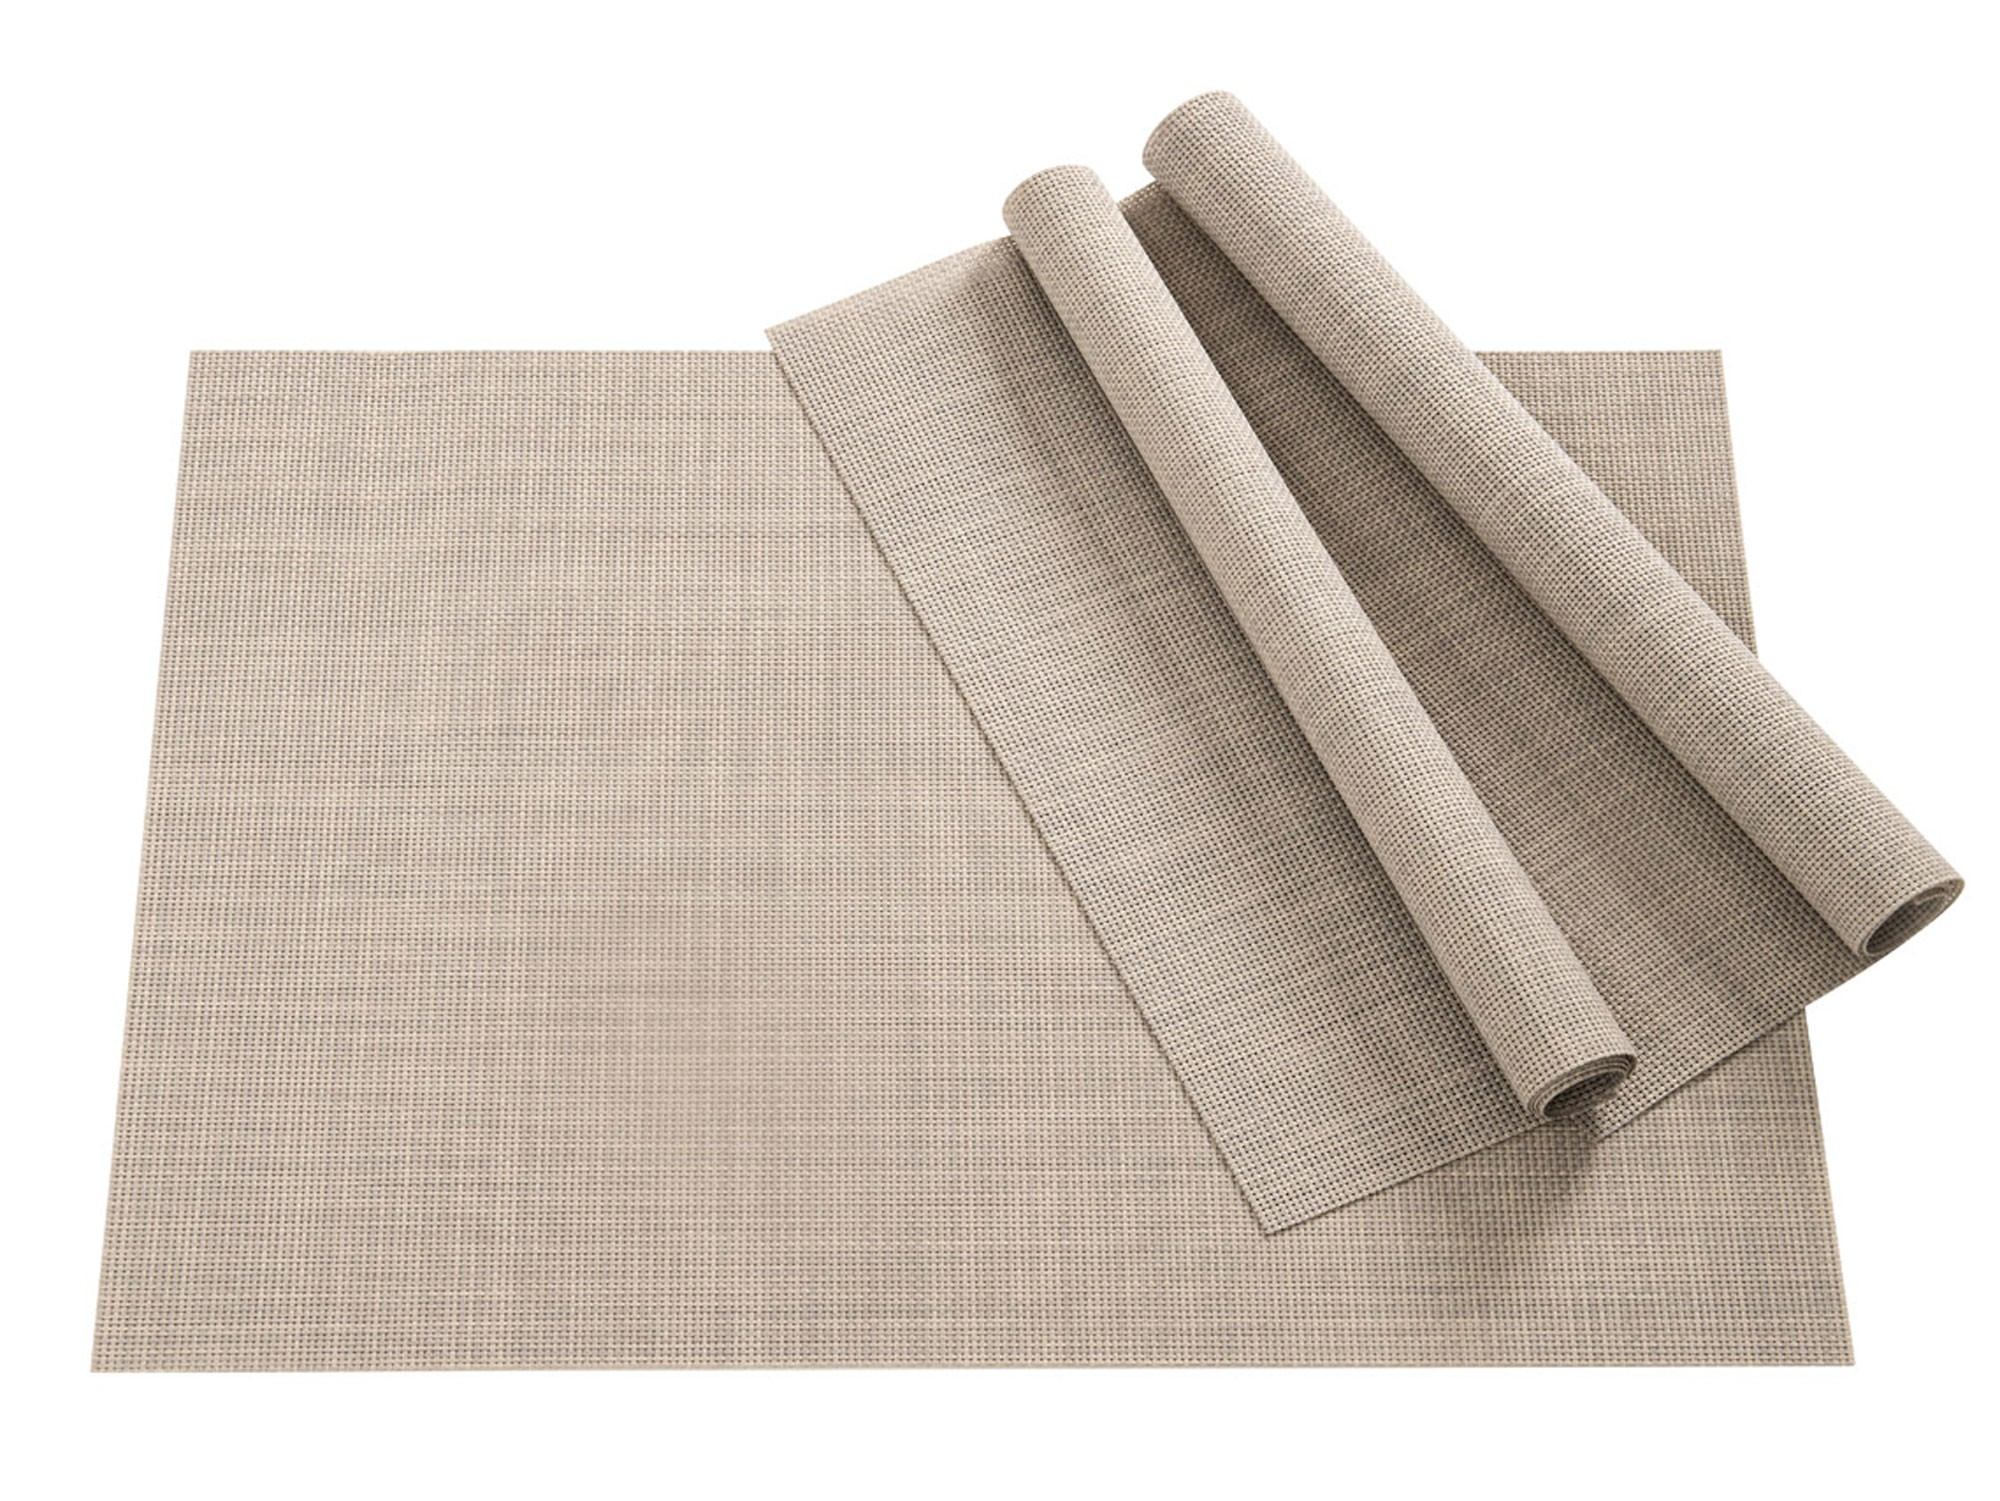 tischsets stoff waschbar simple pvc platzsets bambus famibay stoff tischsets waschbar er set. Black Bedroom Furniture Sets. Home Design Ideas